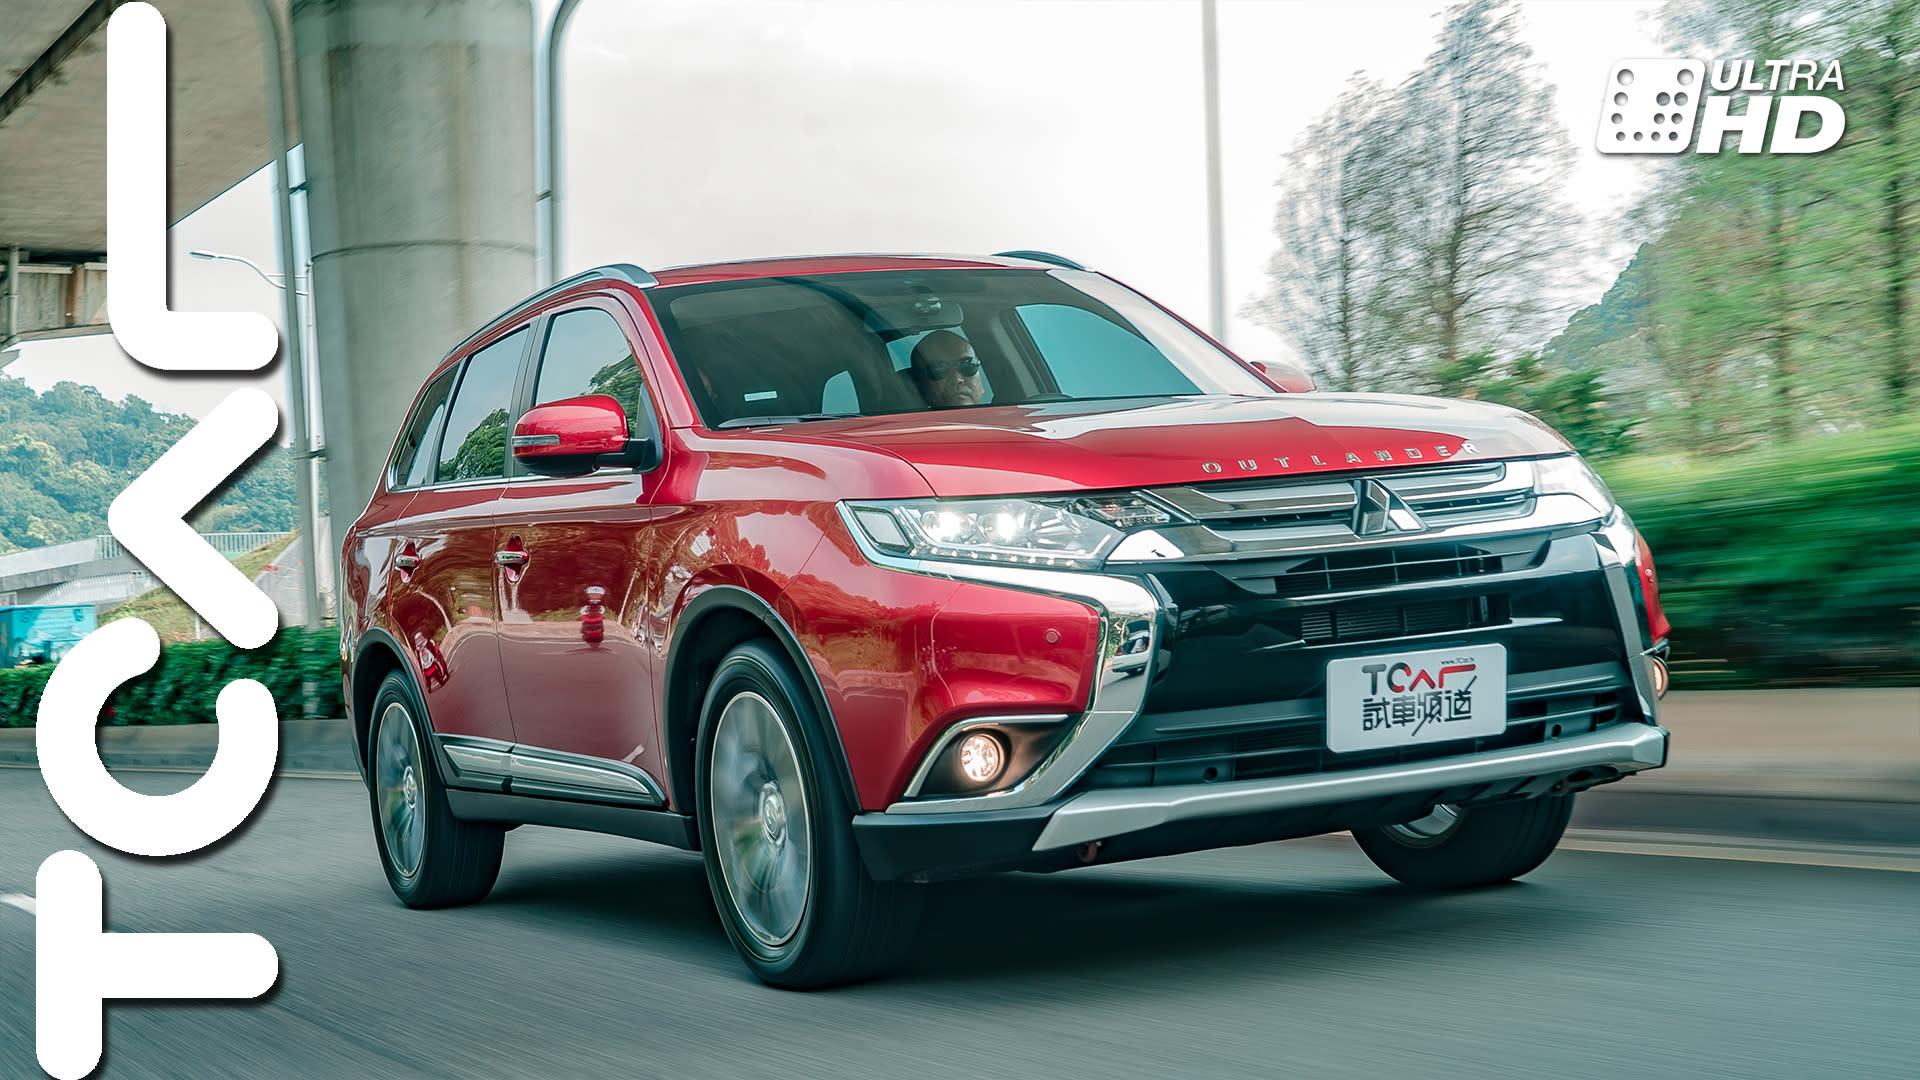 主動真安全,標配不必選! 2018 Mitsubishi Outlander 2.4L 新車試駕 - TCAR